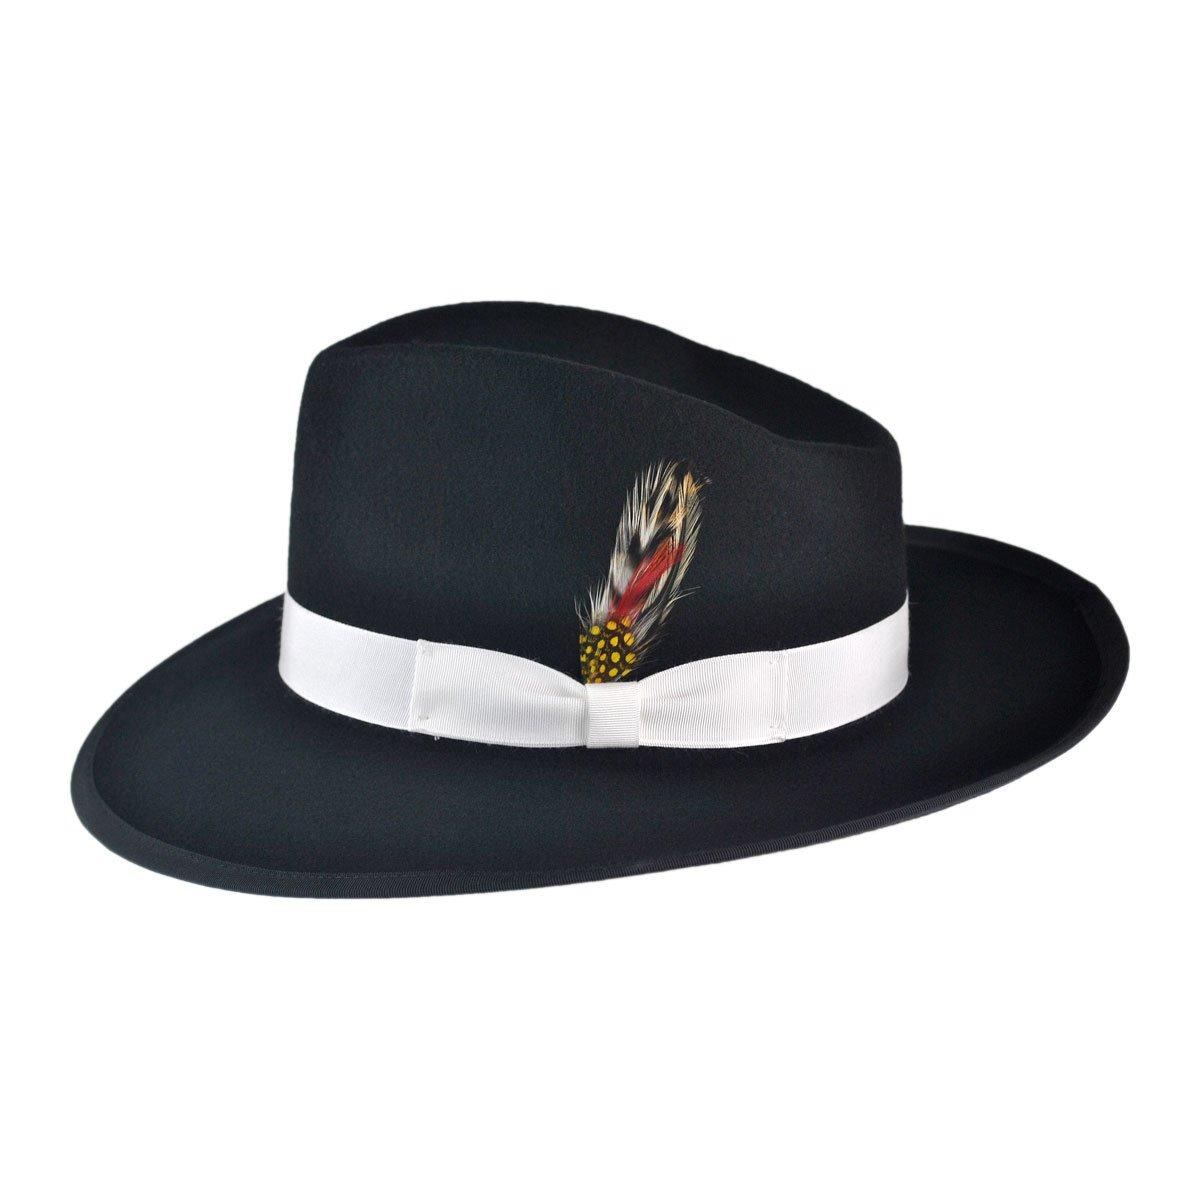 8a6c4d7ad Jaxon Made in The USA - Classics Zoot Wool Felt Fedora Hat at Amazon ...